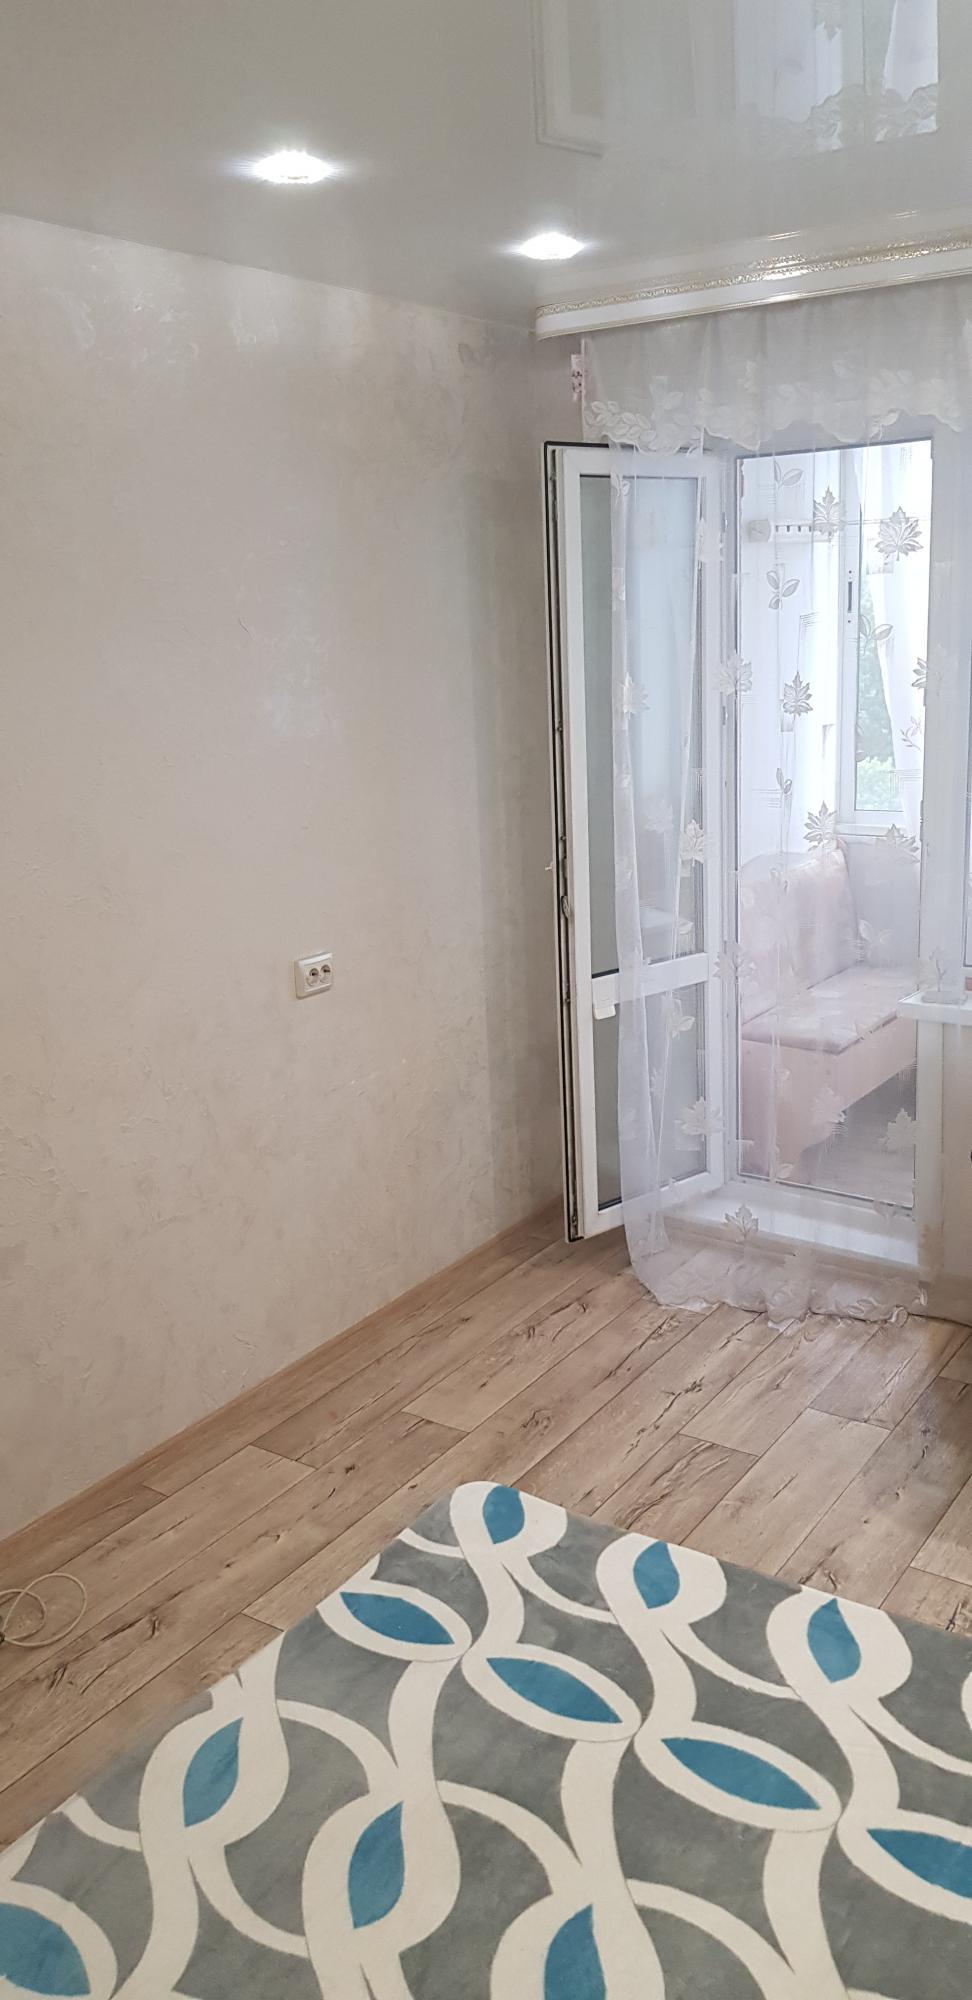 2к квартира улица Краснодарская, 3 | 18000 | аренда в Красноярске фото 2